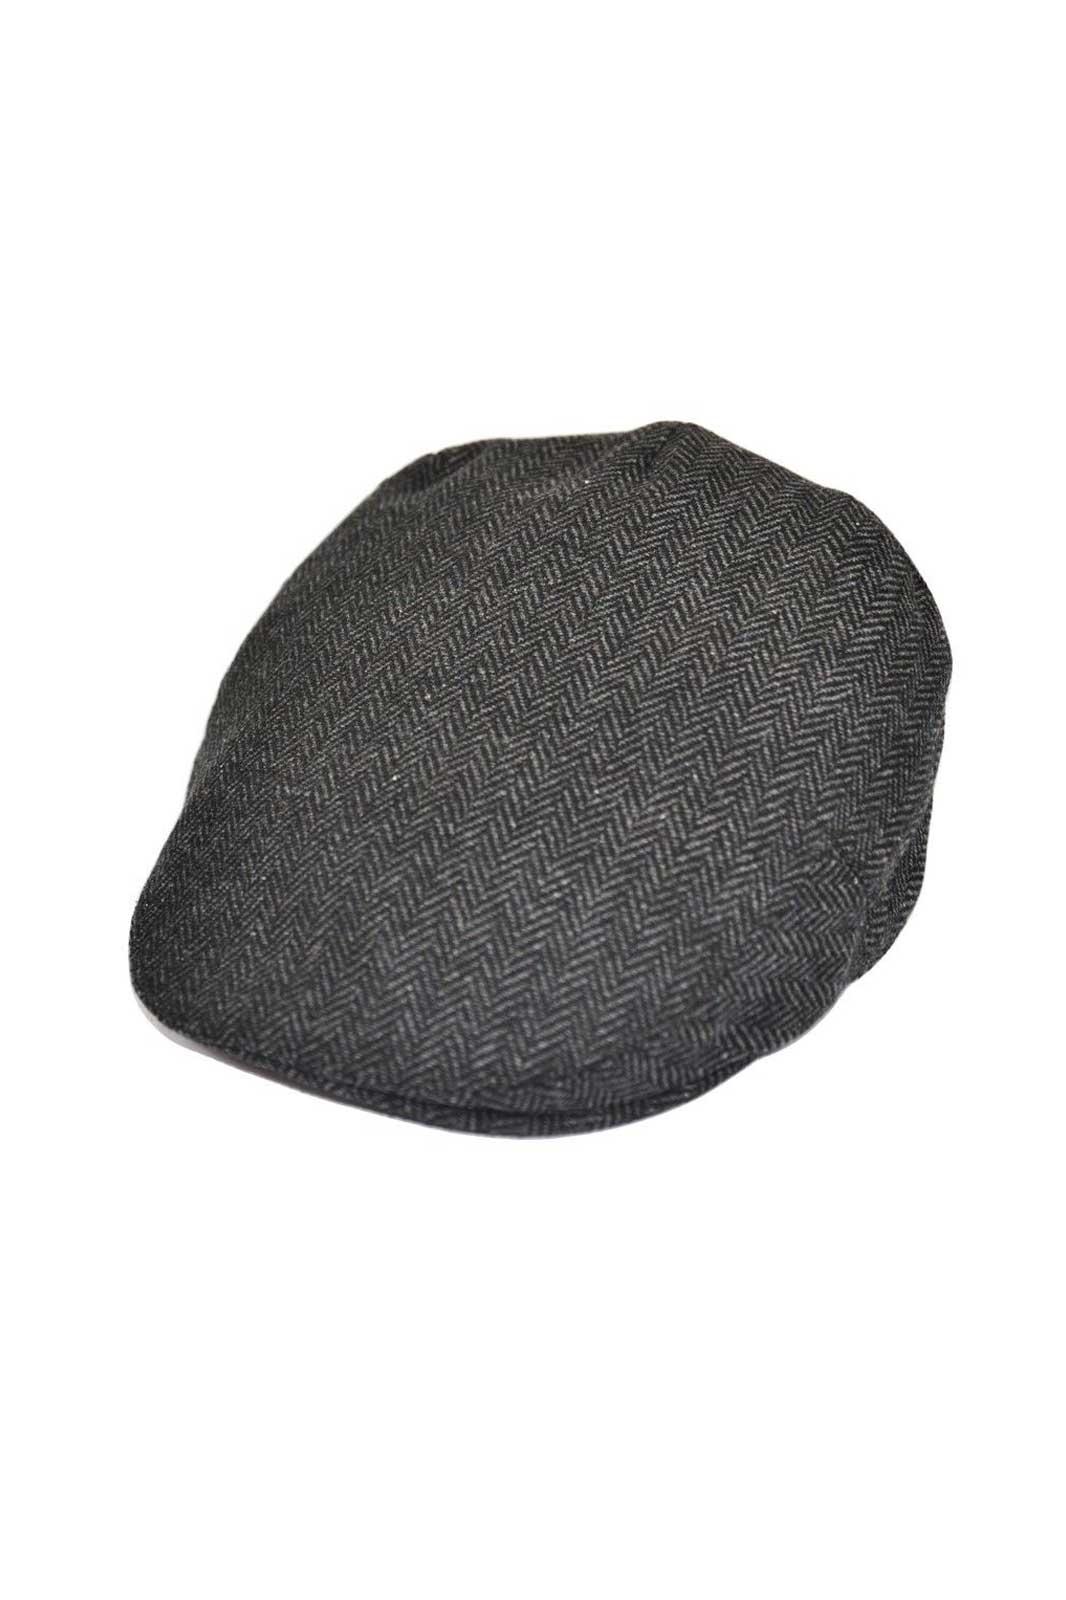 G&H Herringbone Flat Cap Grey